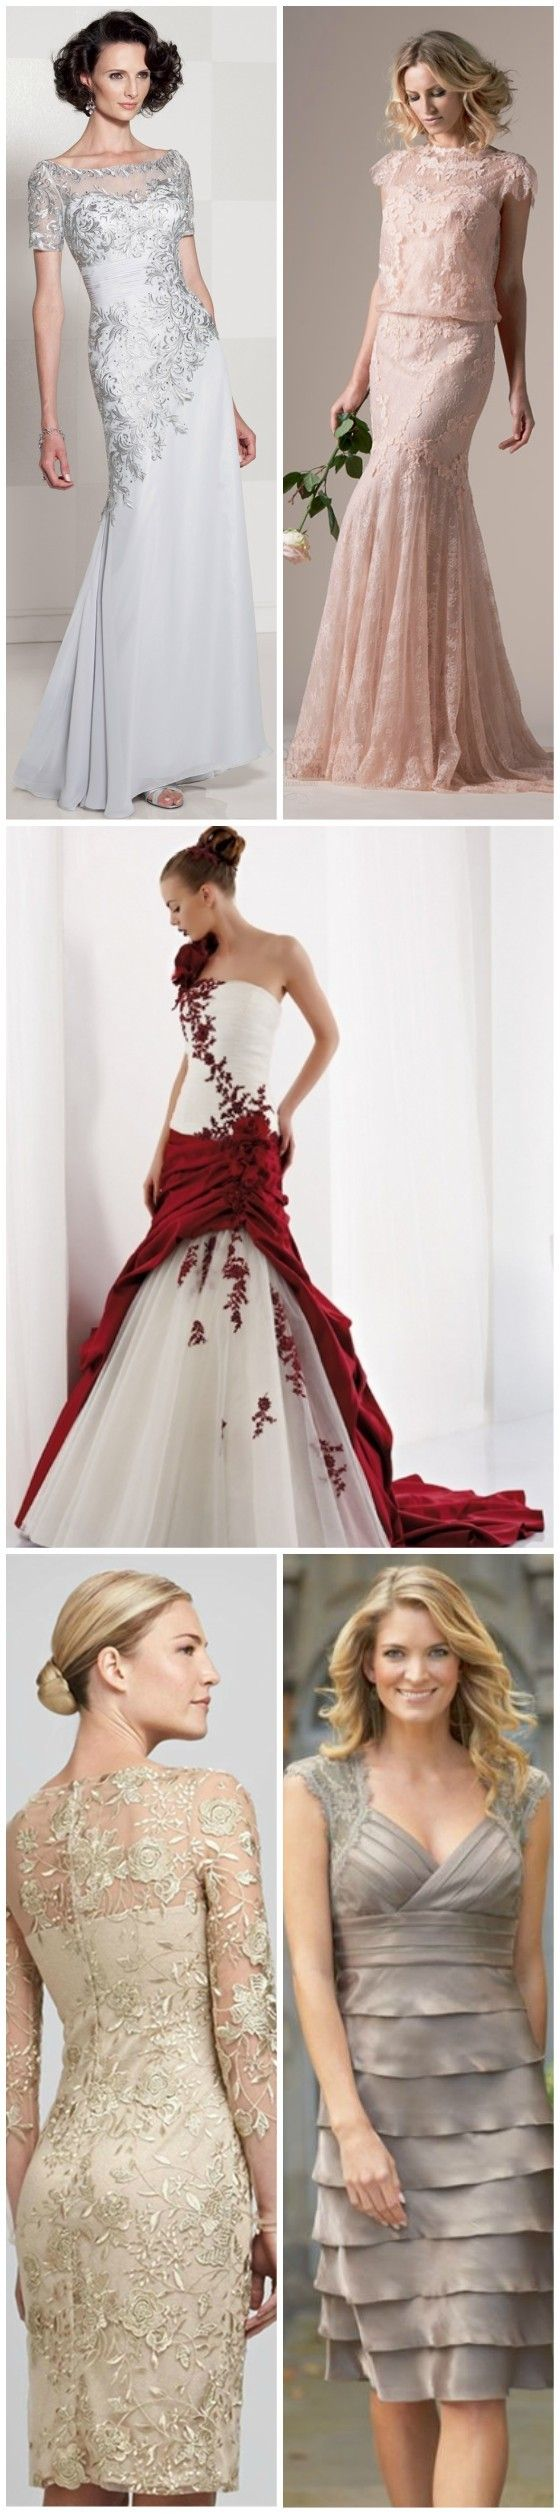 Color Wedding Dress for Bride Over 40, 50, 60, 70 Womens